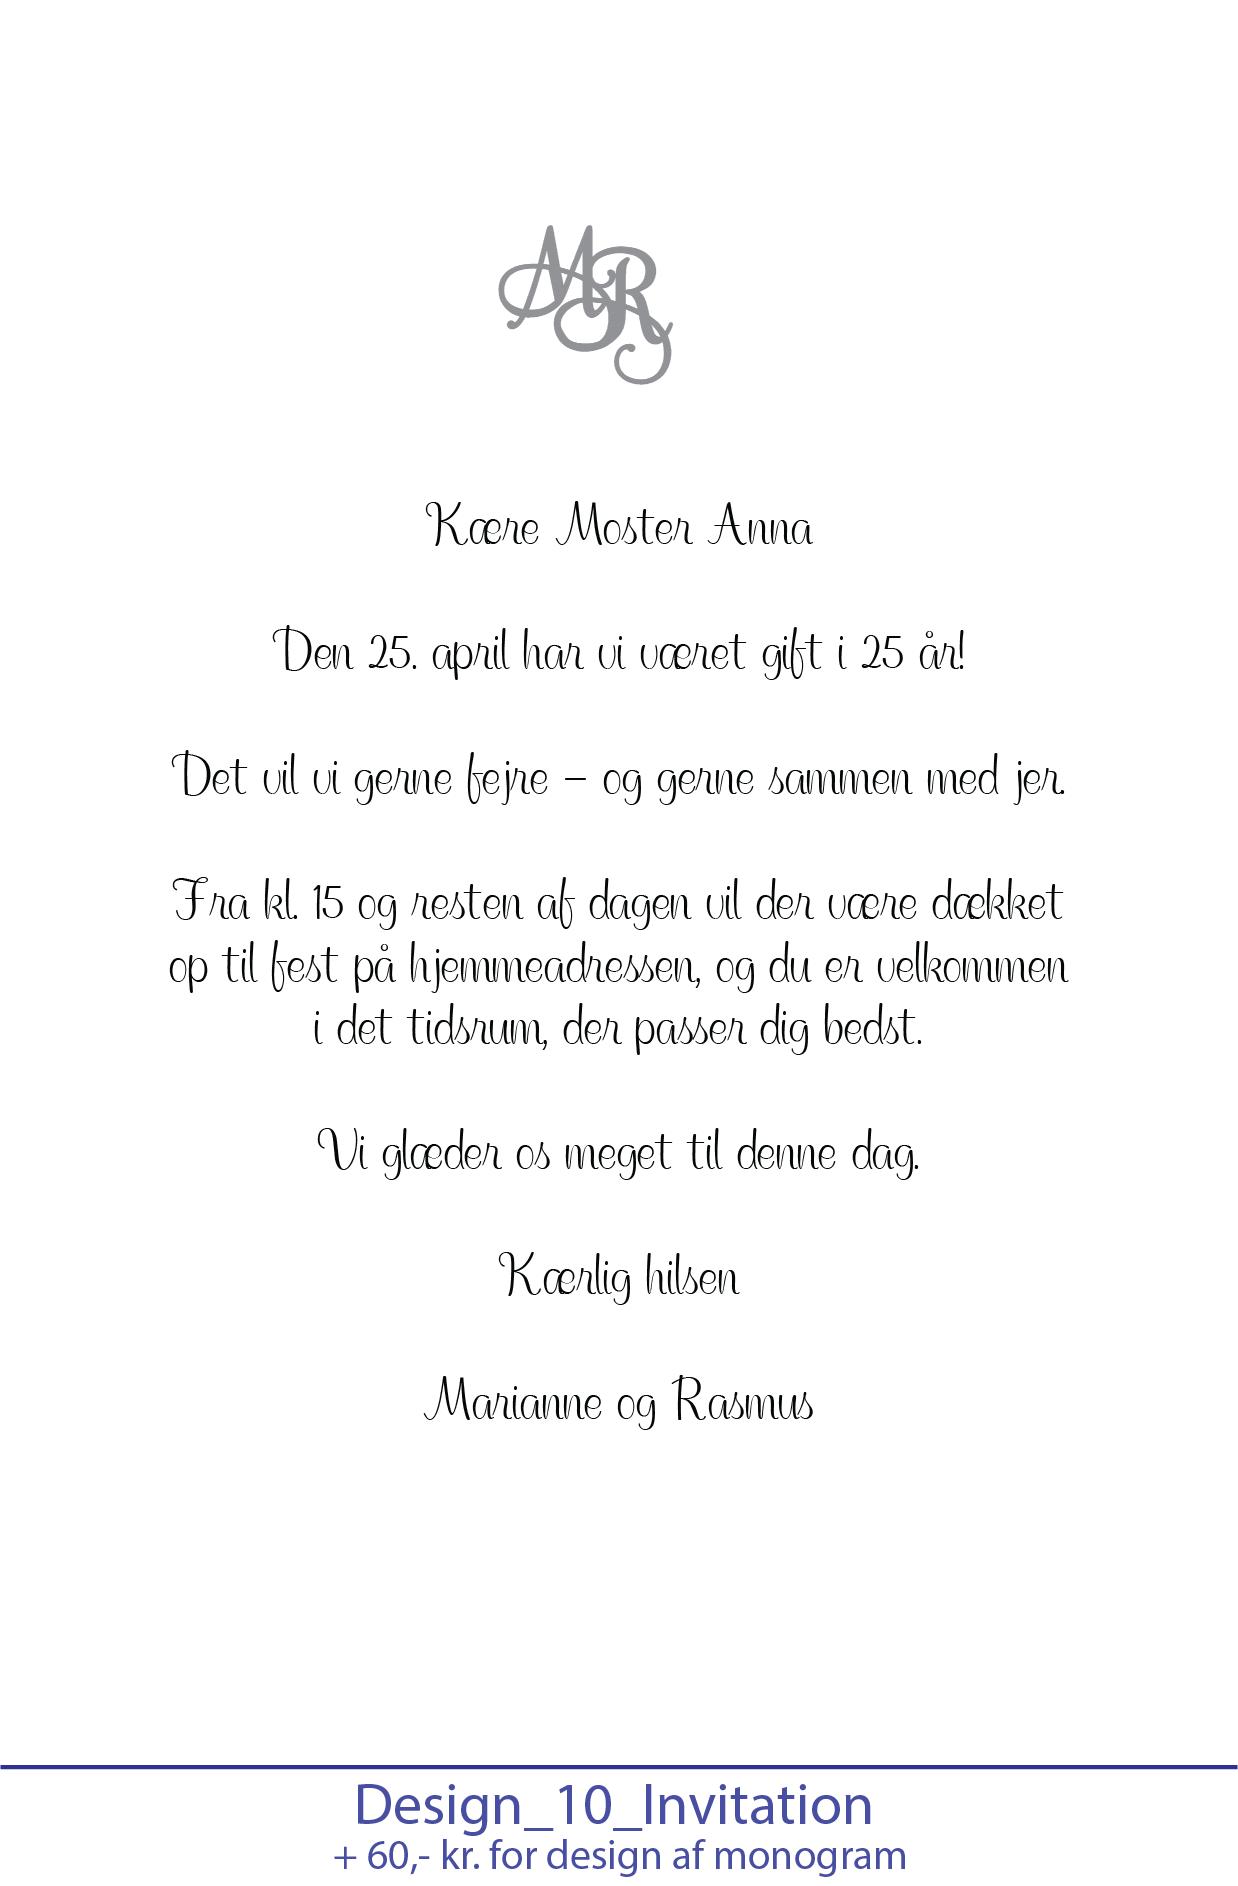 Invitationsopsætning med monogram - Design 10